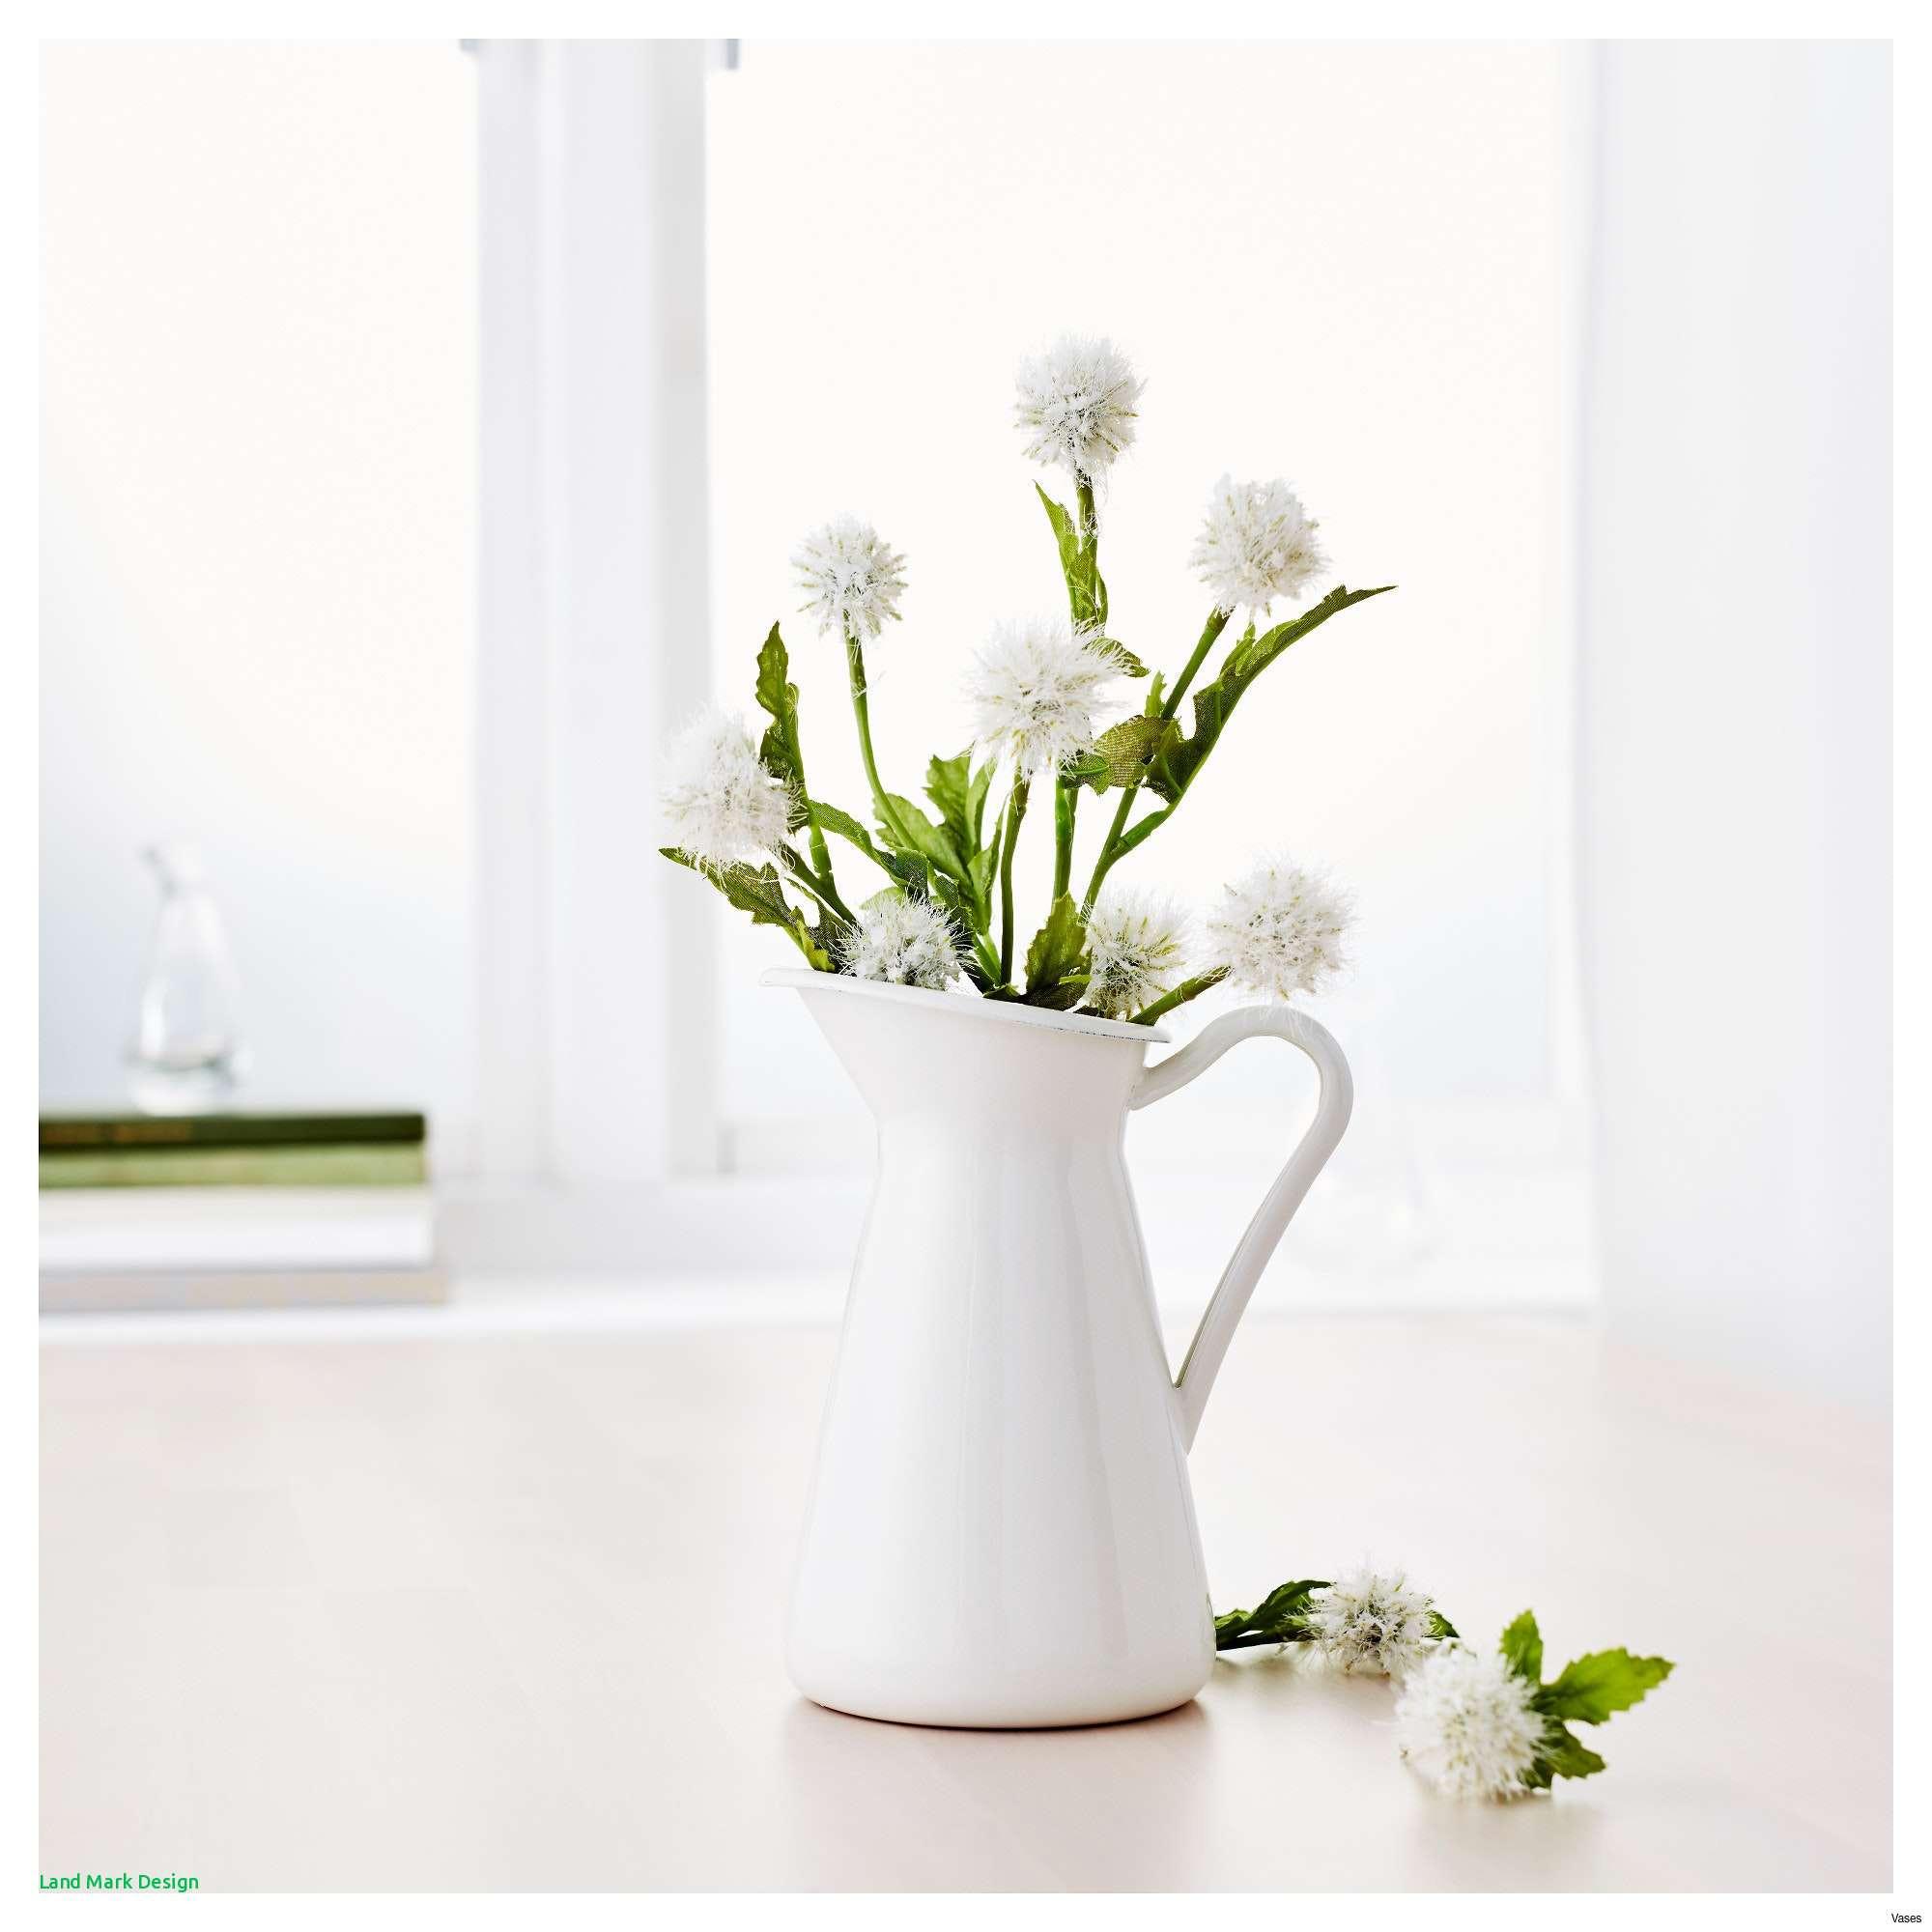 stone flower vases of large flower vase design home design with regard to 0429885 pe584248 s5h vases ikea flower i 0d